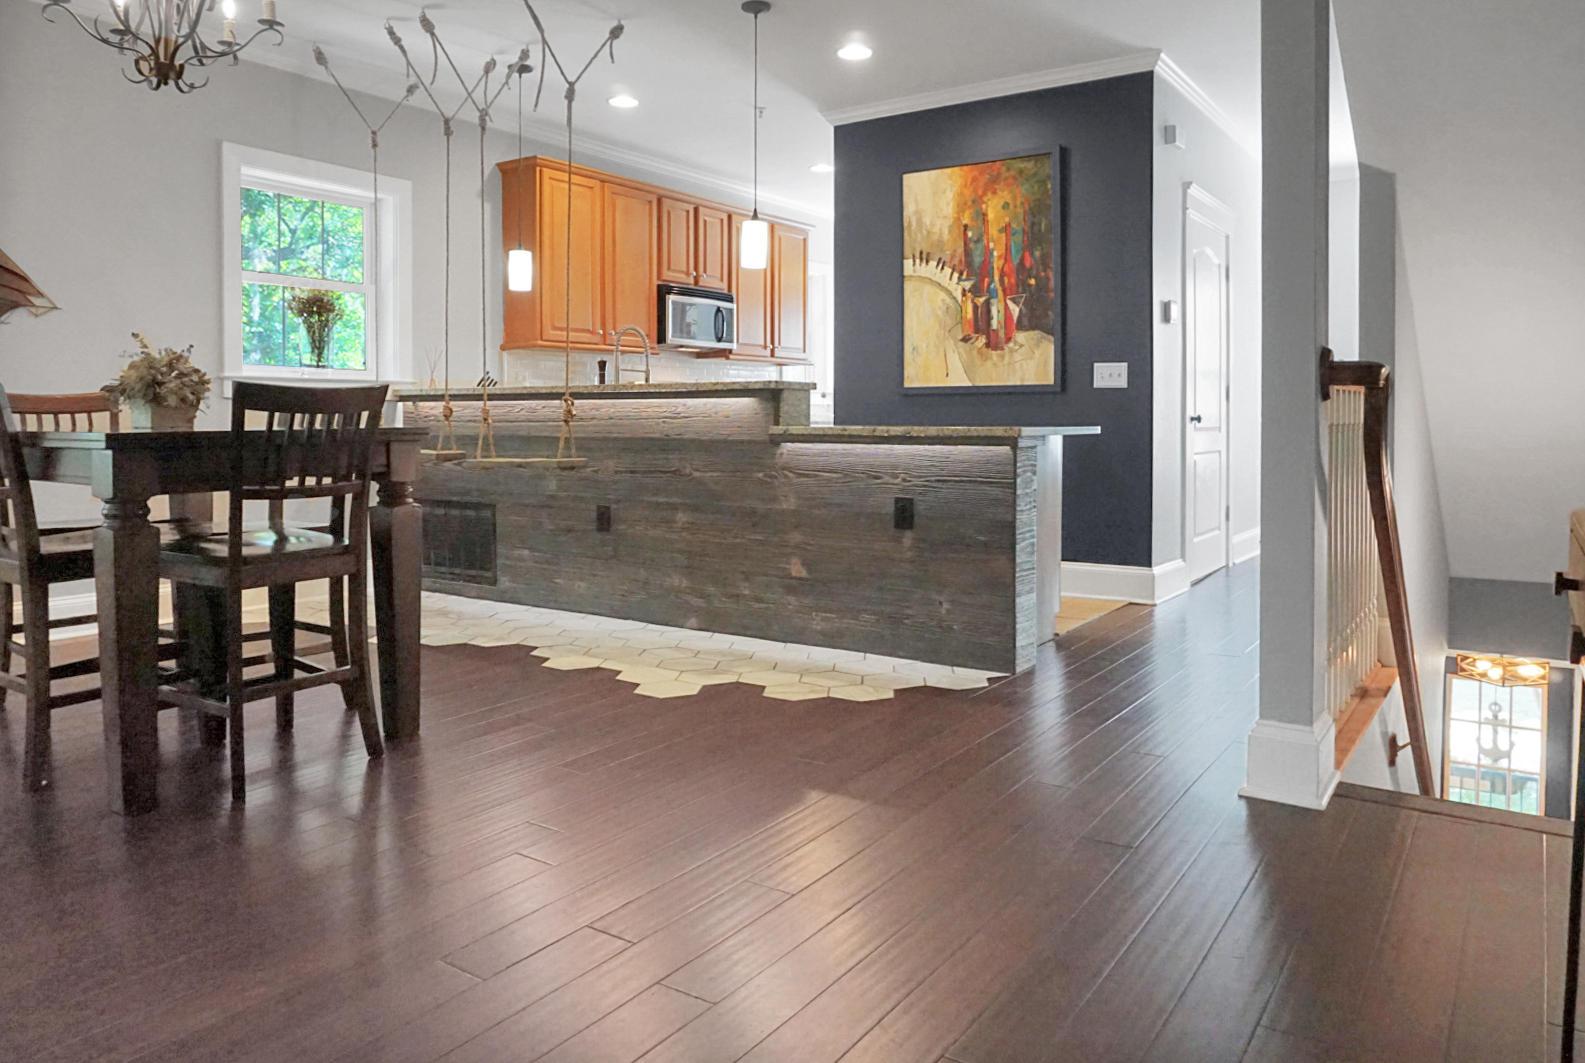 Etiwan Pointe Homes For Sale - 269 Etiwan Pointe, Mount Pleasant, SC - 58